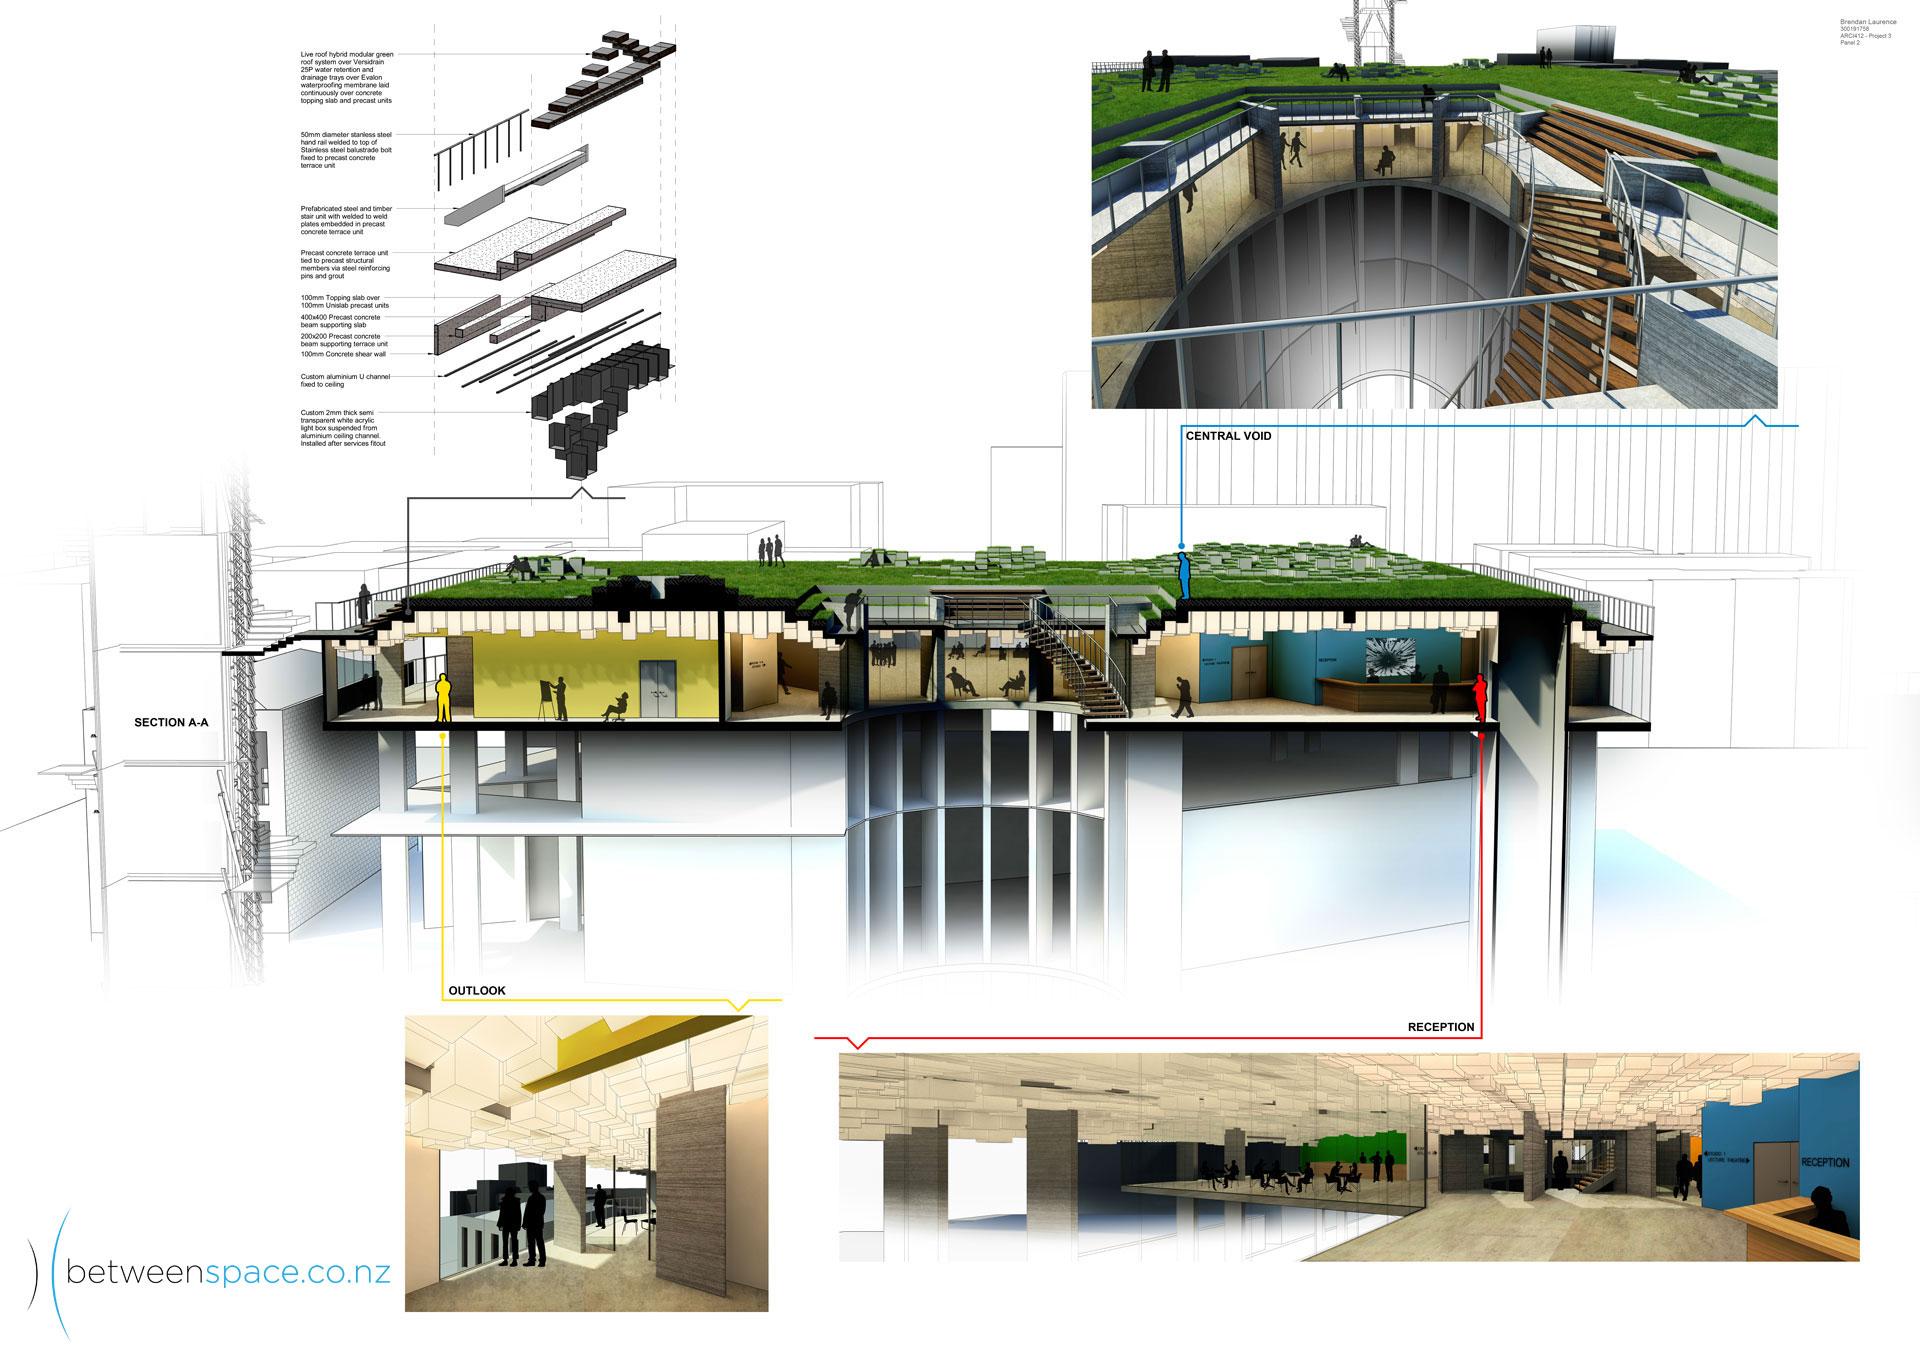 Brendan-Laurence-300191758---ARCI421---Project-3---Final-Panels-2